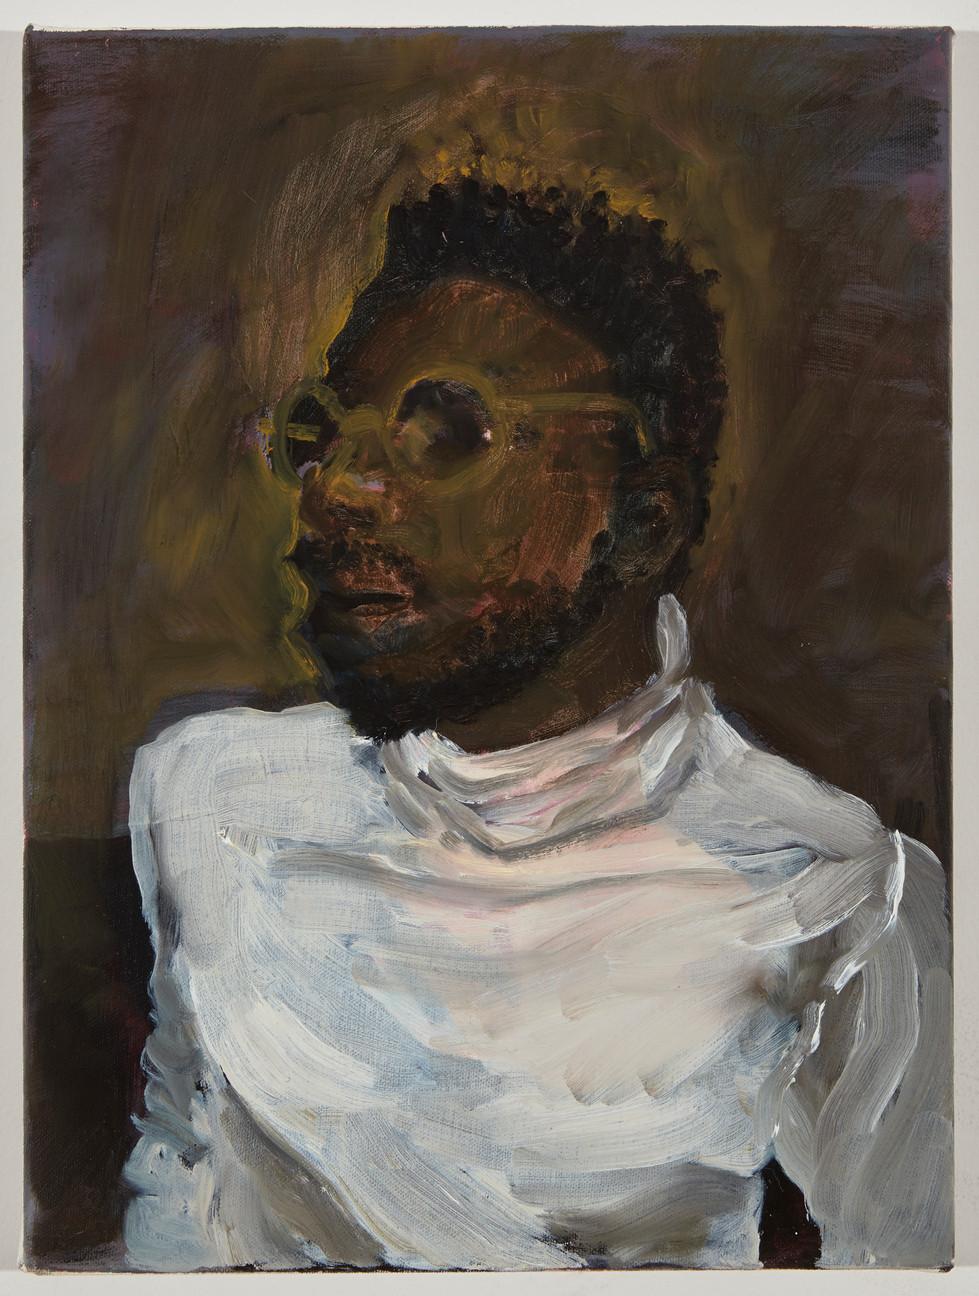 N, oil on canvas, 2020